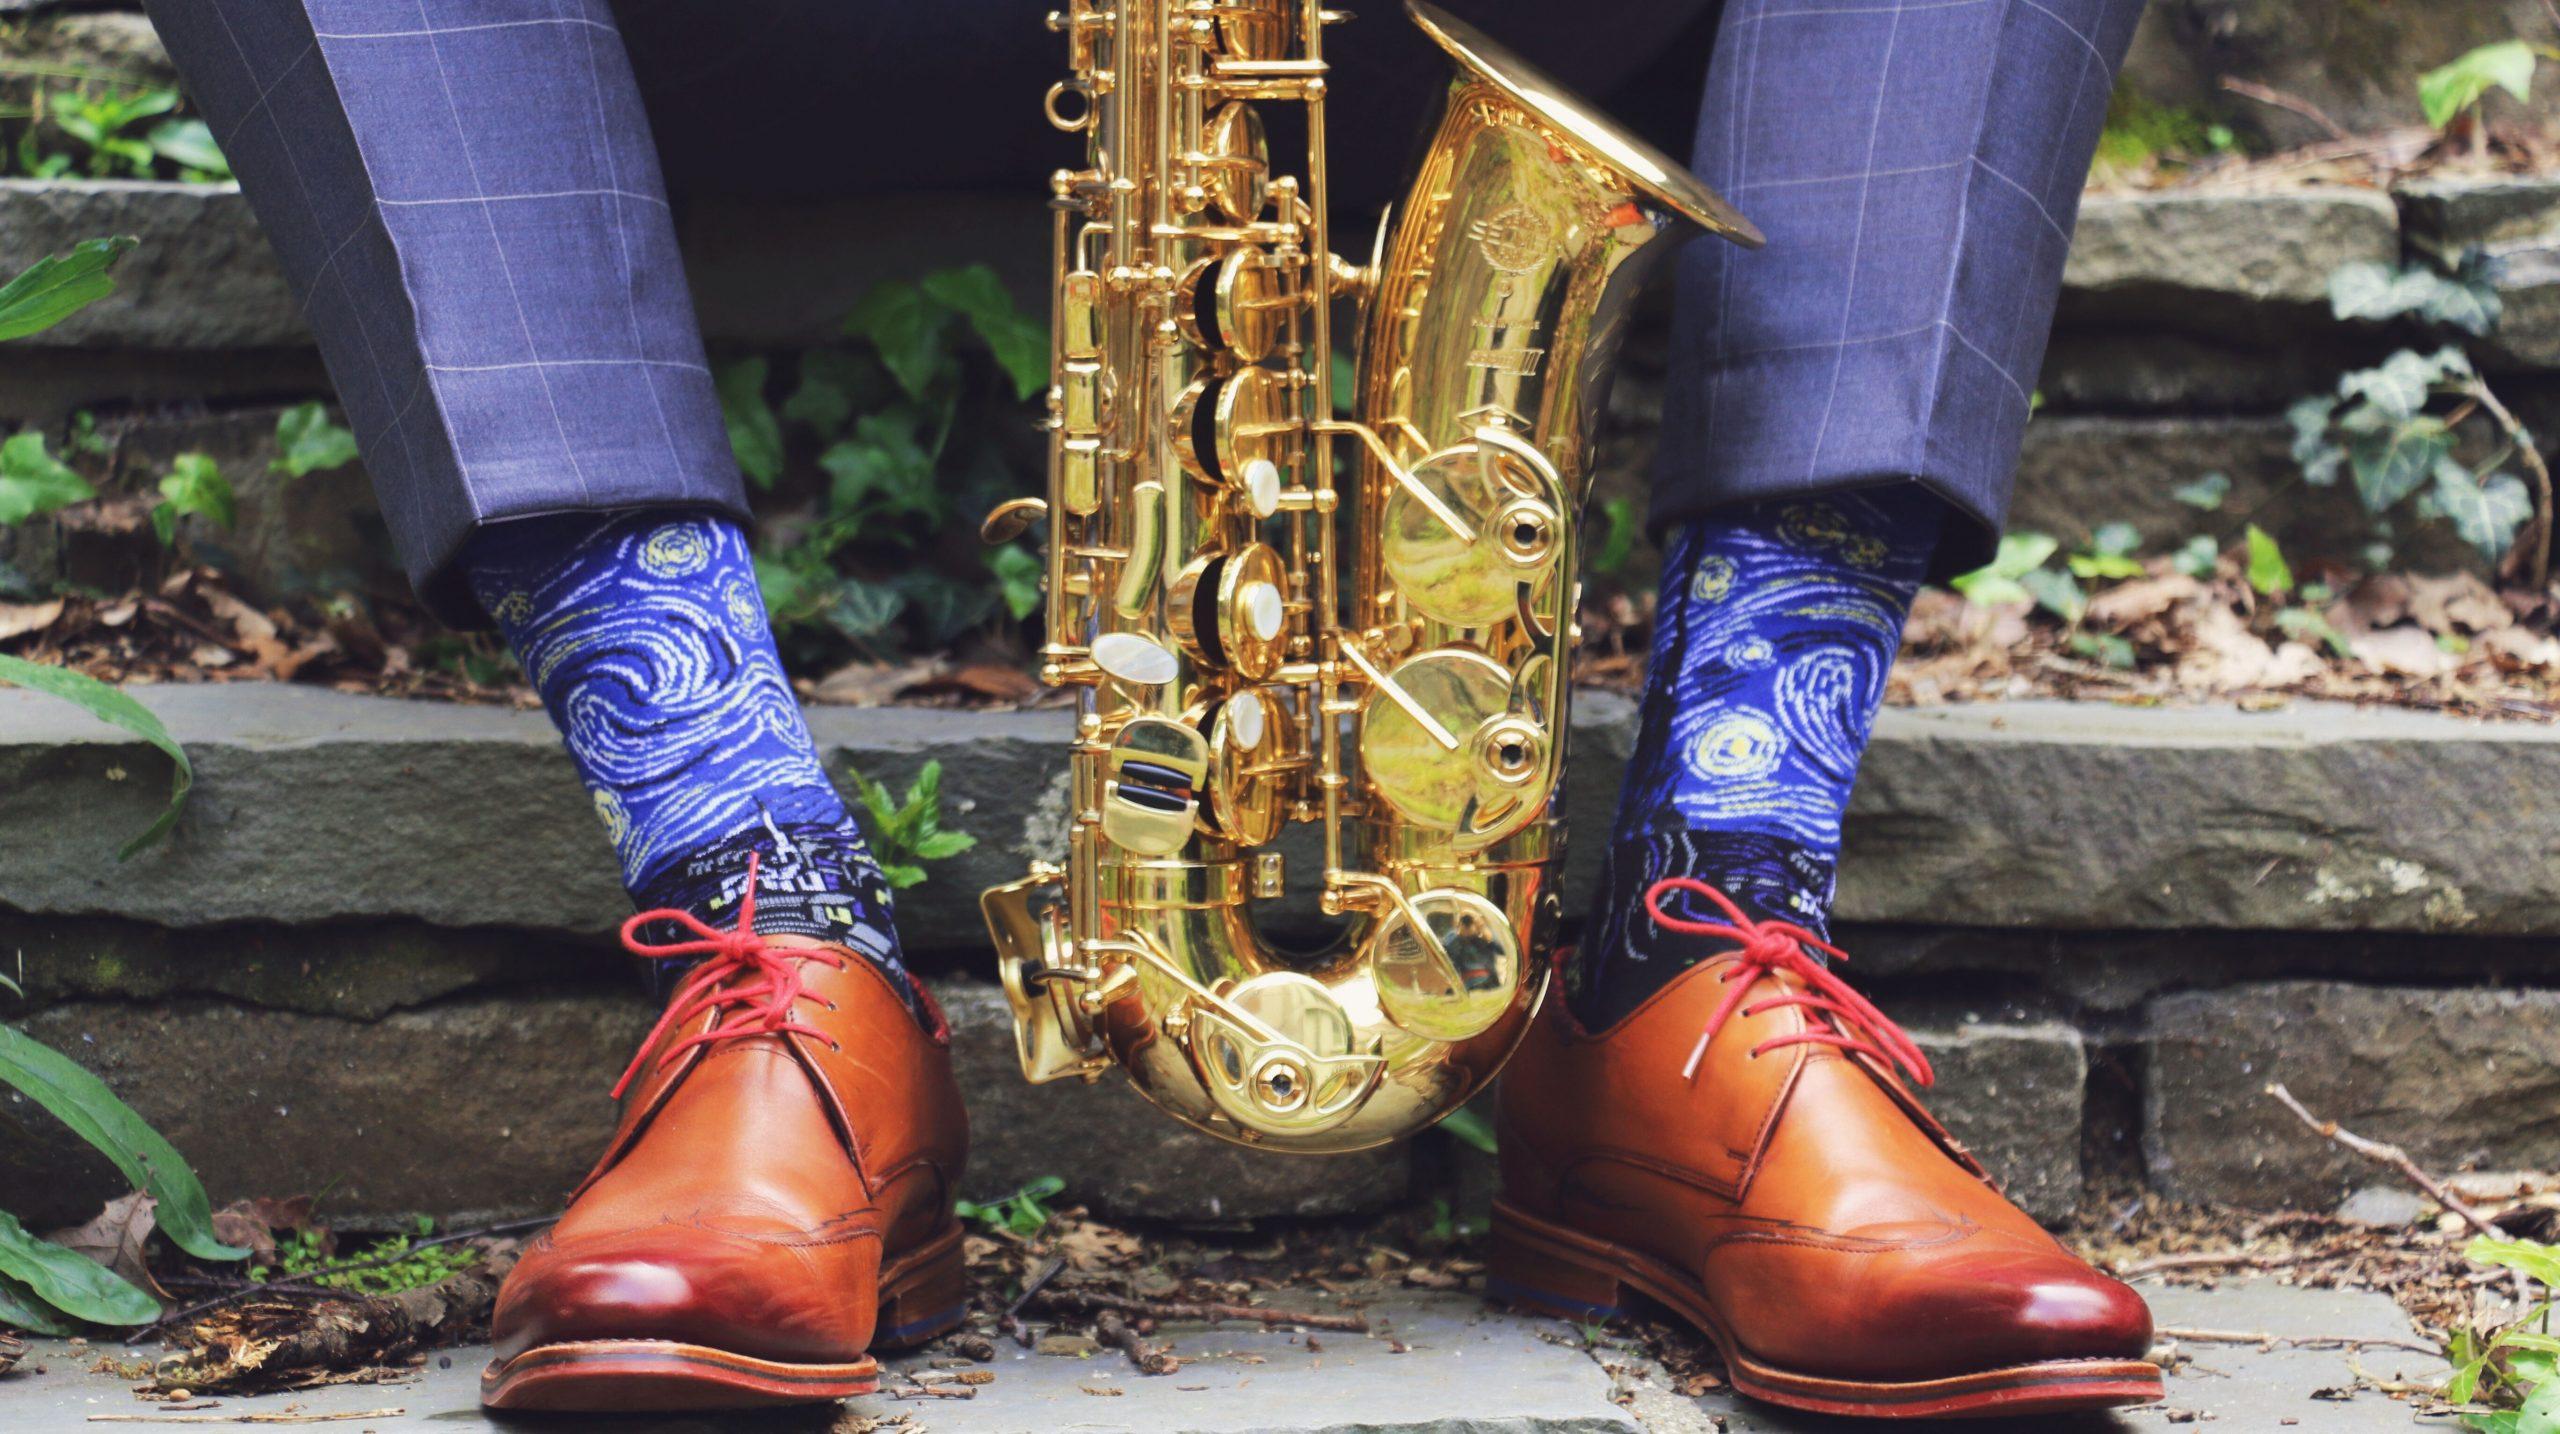 Art Socks Starry Night and alto sax